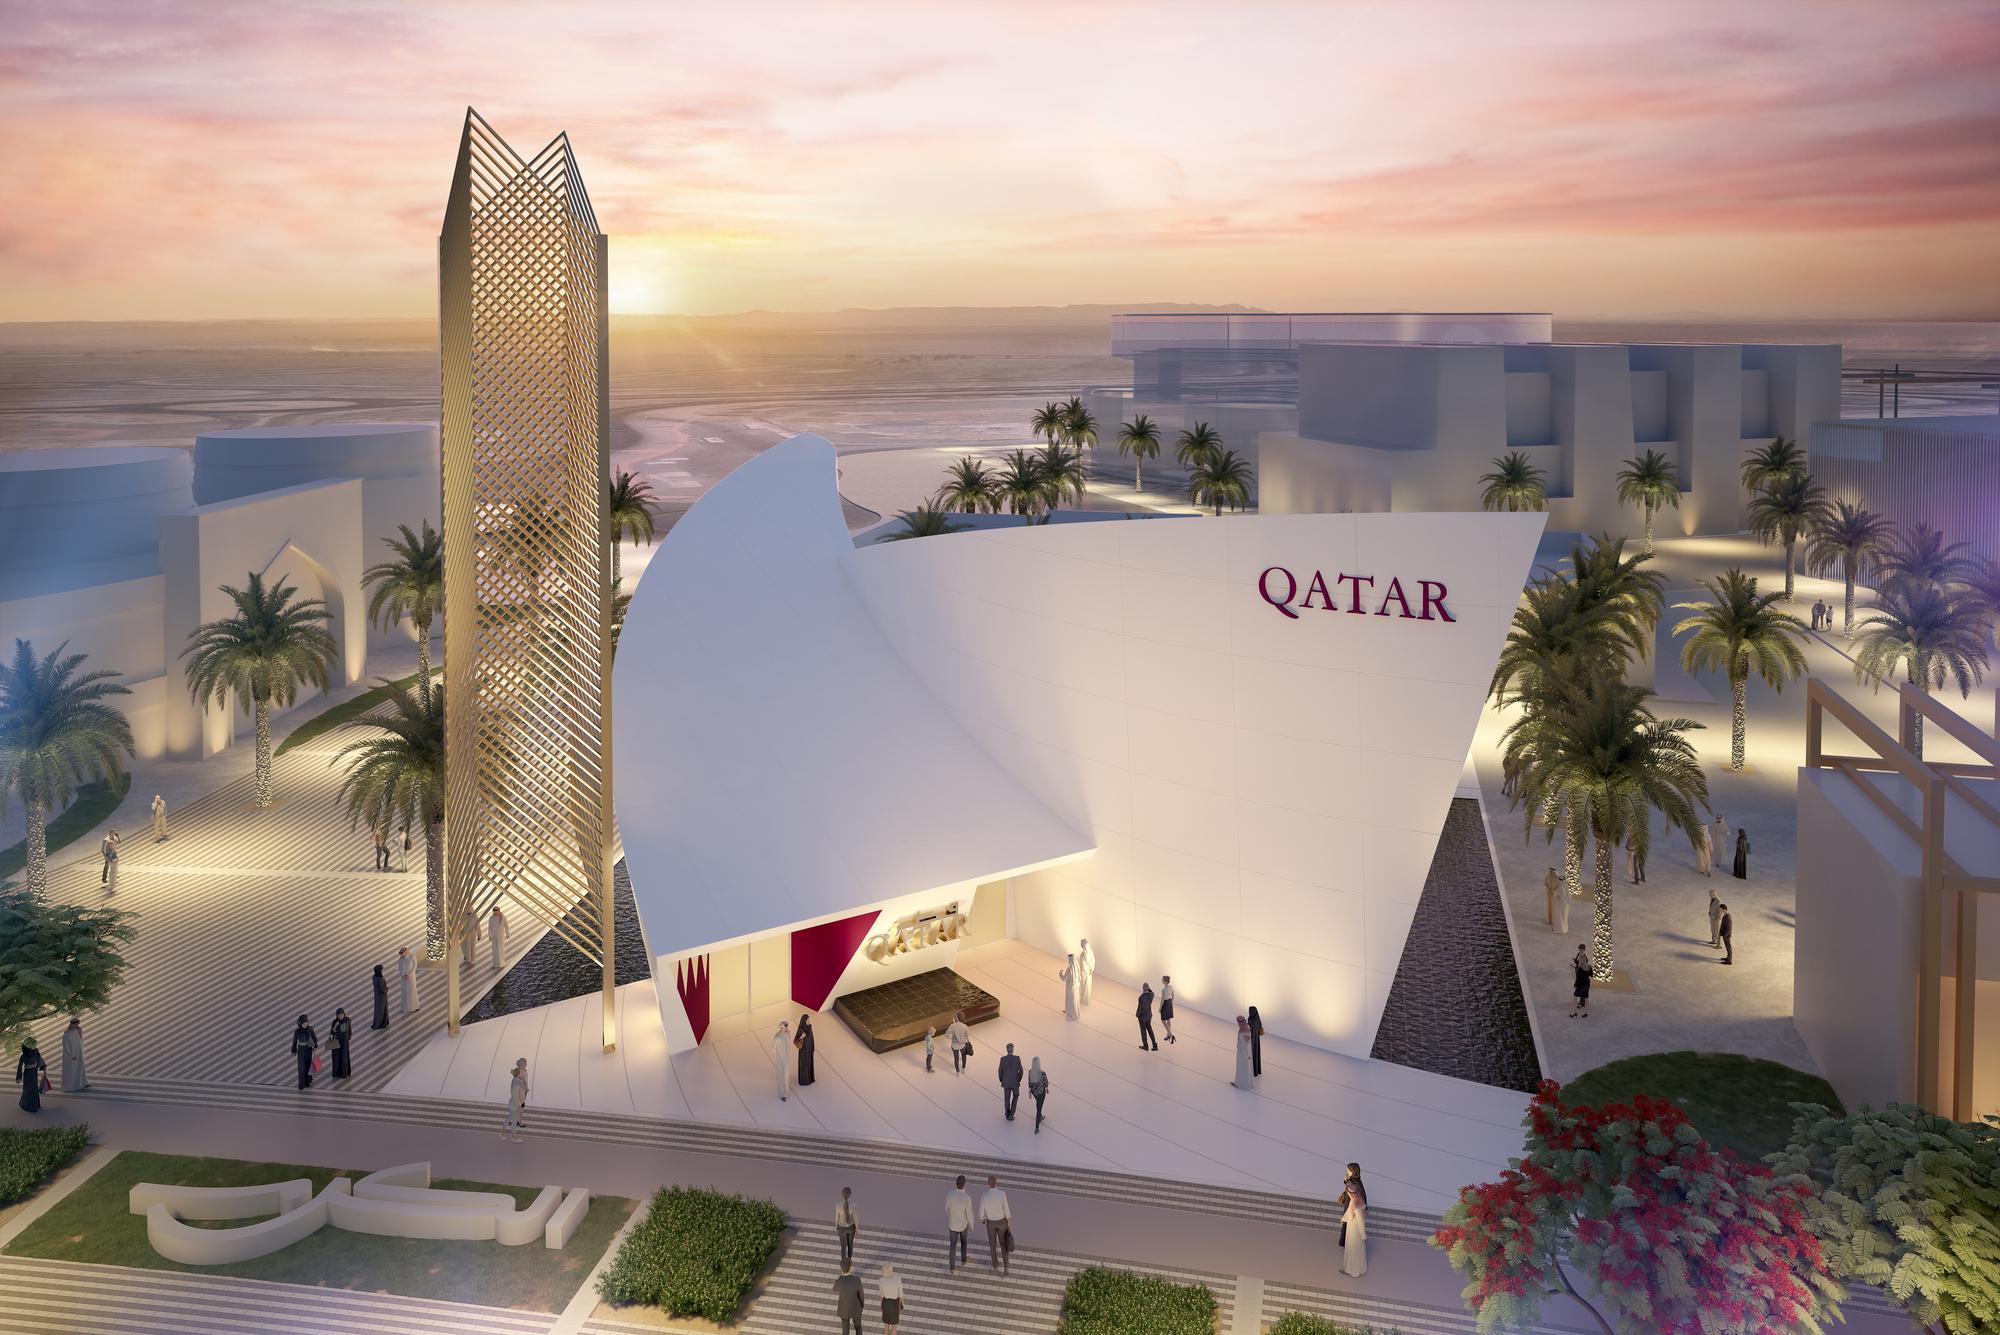 Qatar to Participate in Expo 2020 Dubai Under the Slogan: Qatar: the Future is Now